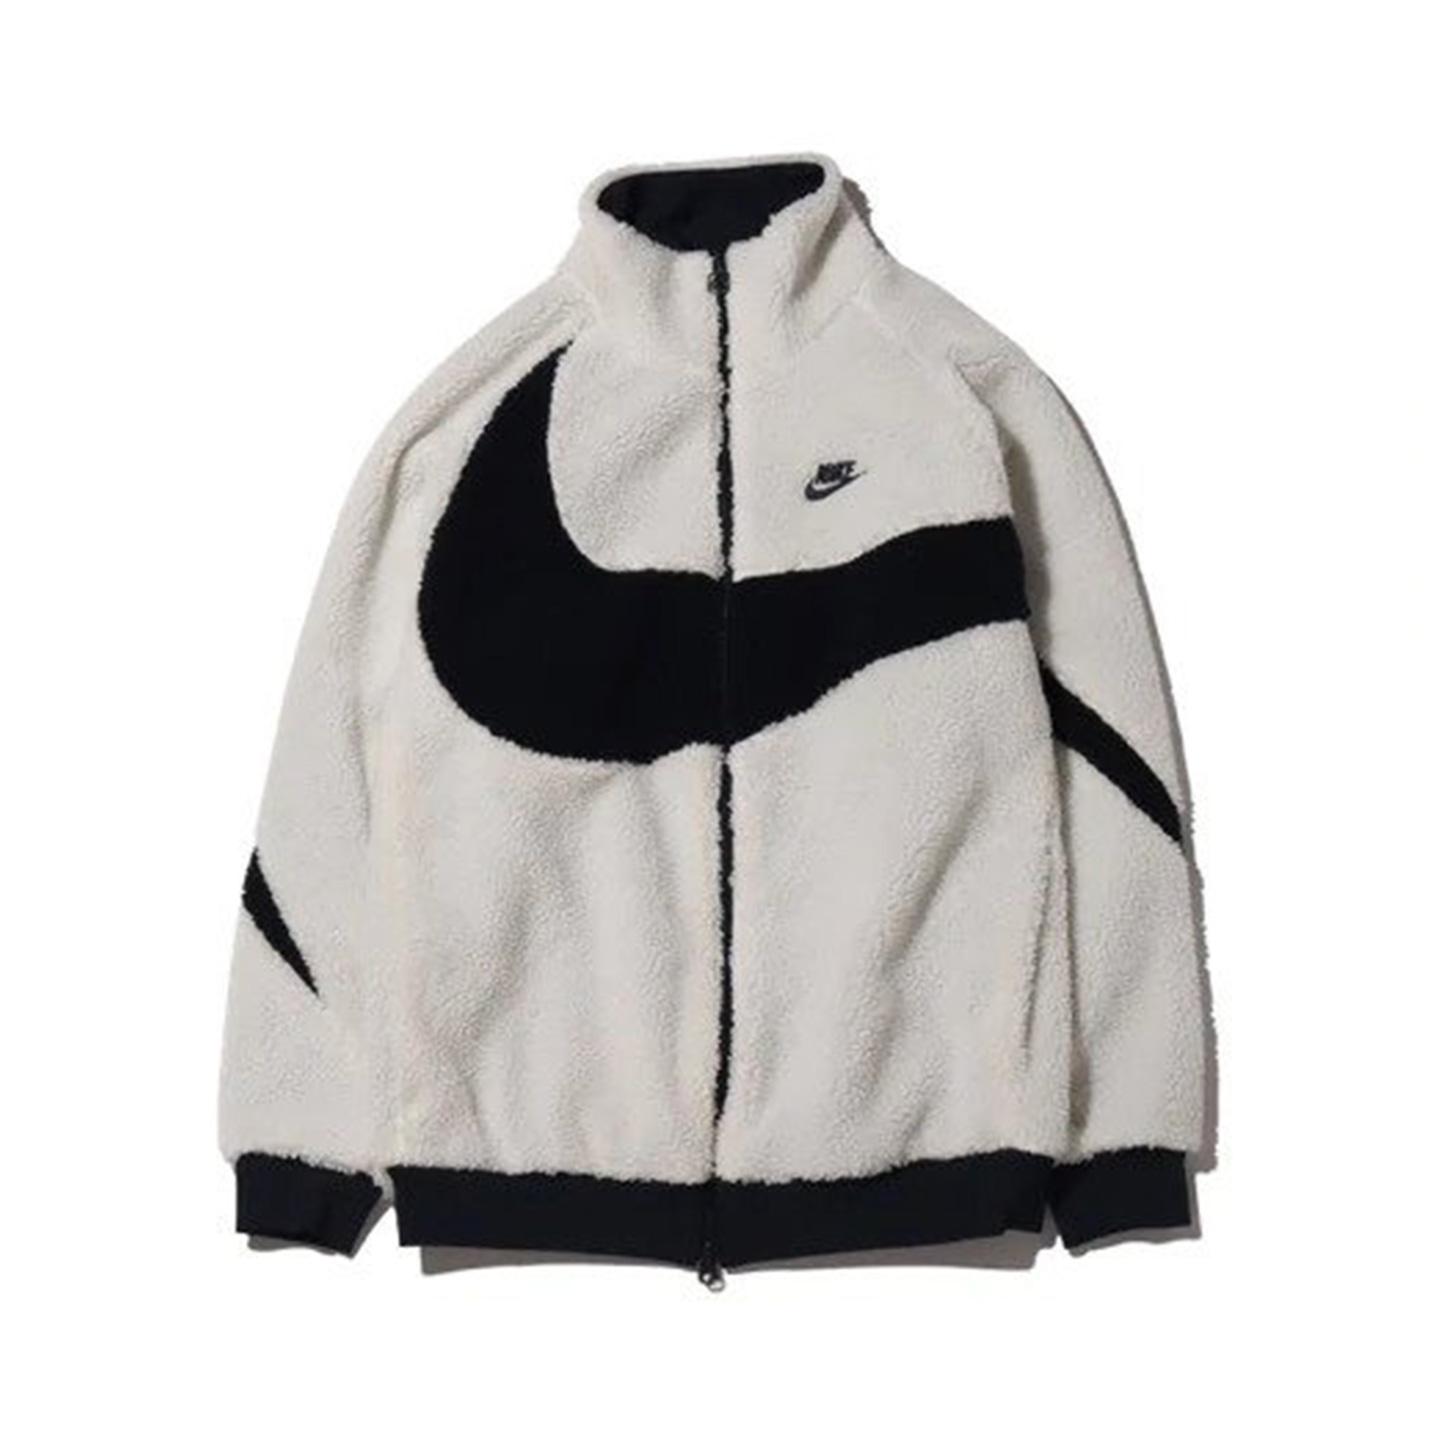 Nike VM Big Swoosh Full Zip Jacket White Navy